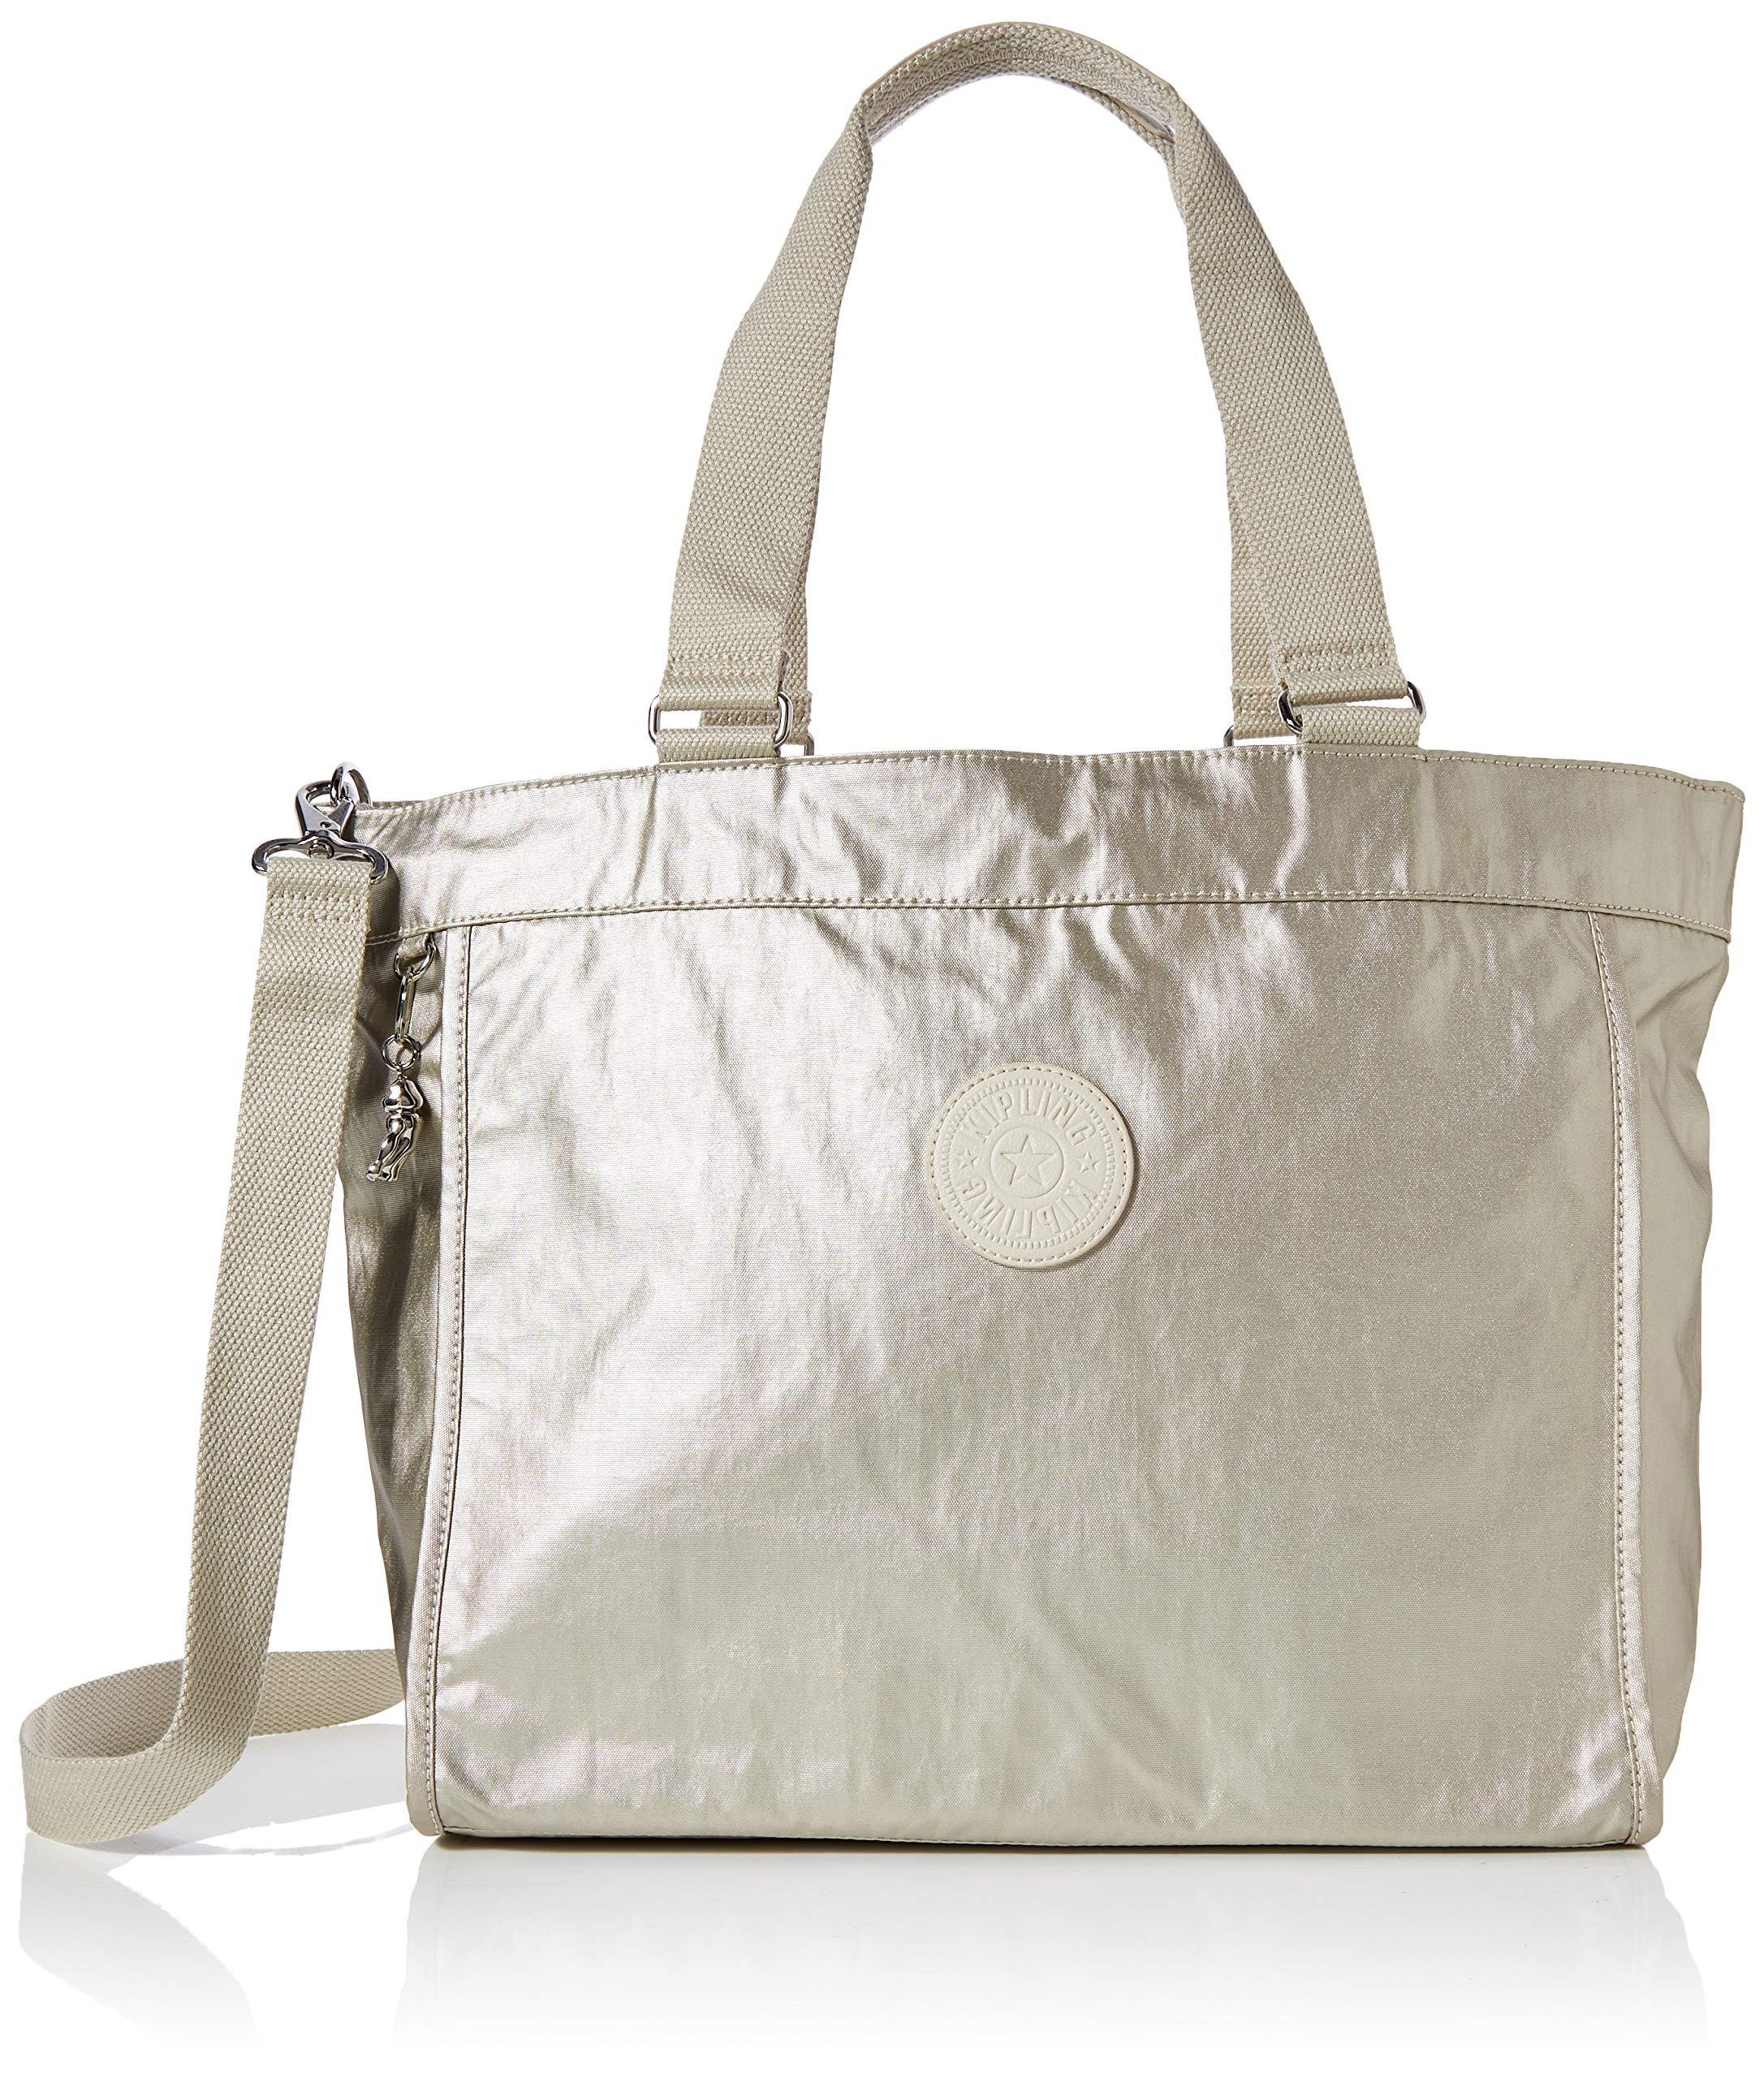 Kipling New L, Bolso Shopper para Mujer, 48.5x34x17.5 centimeters (B x H x T)